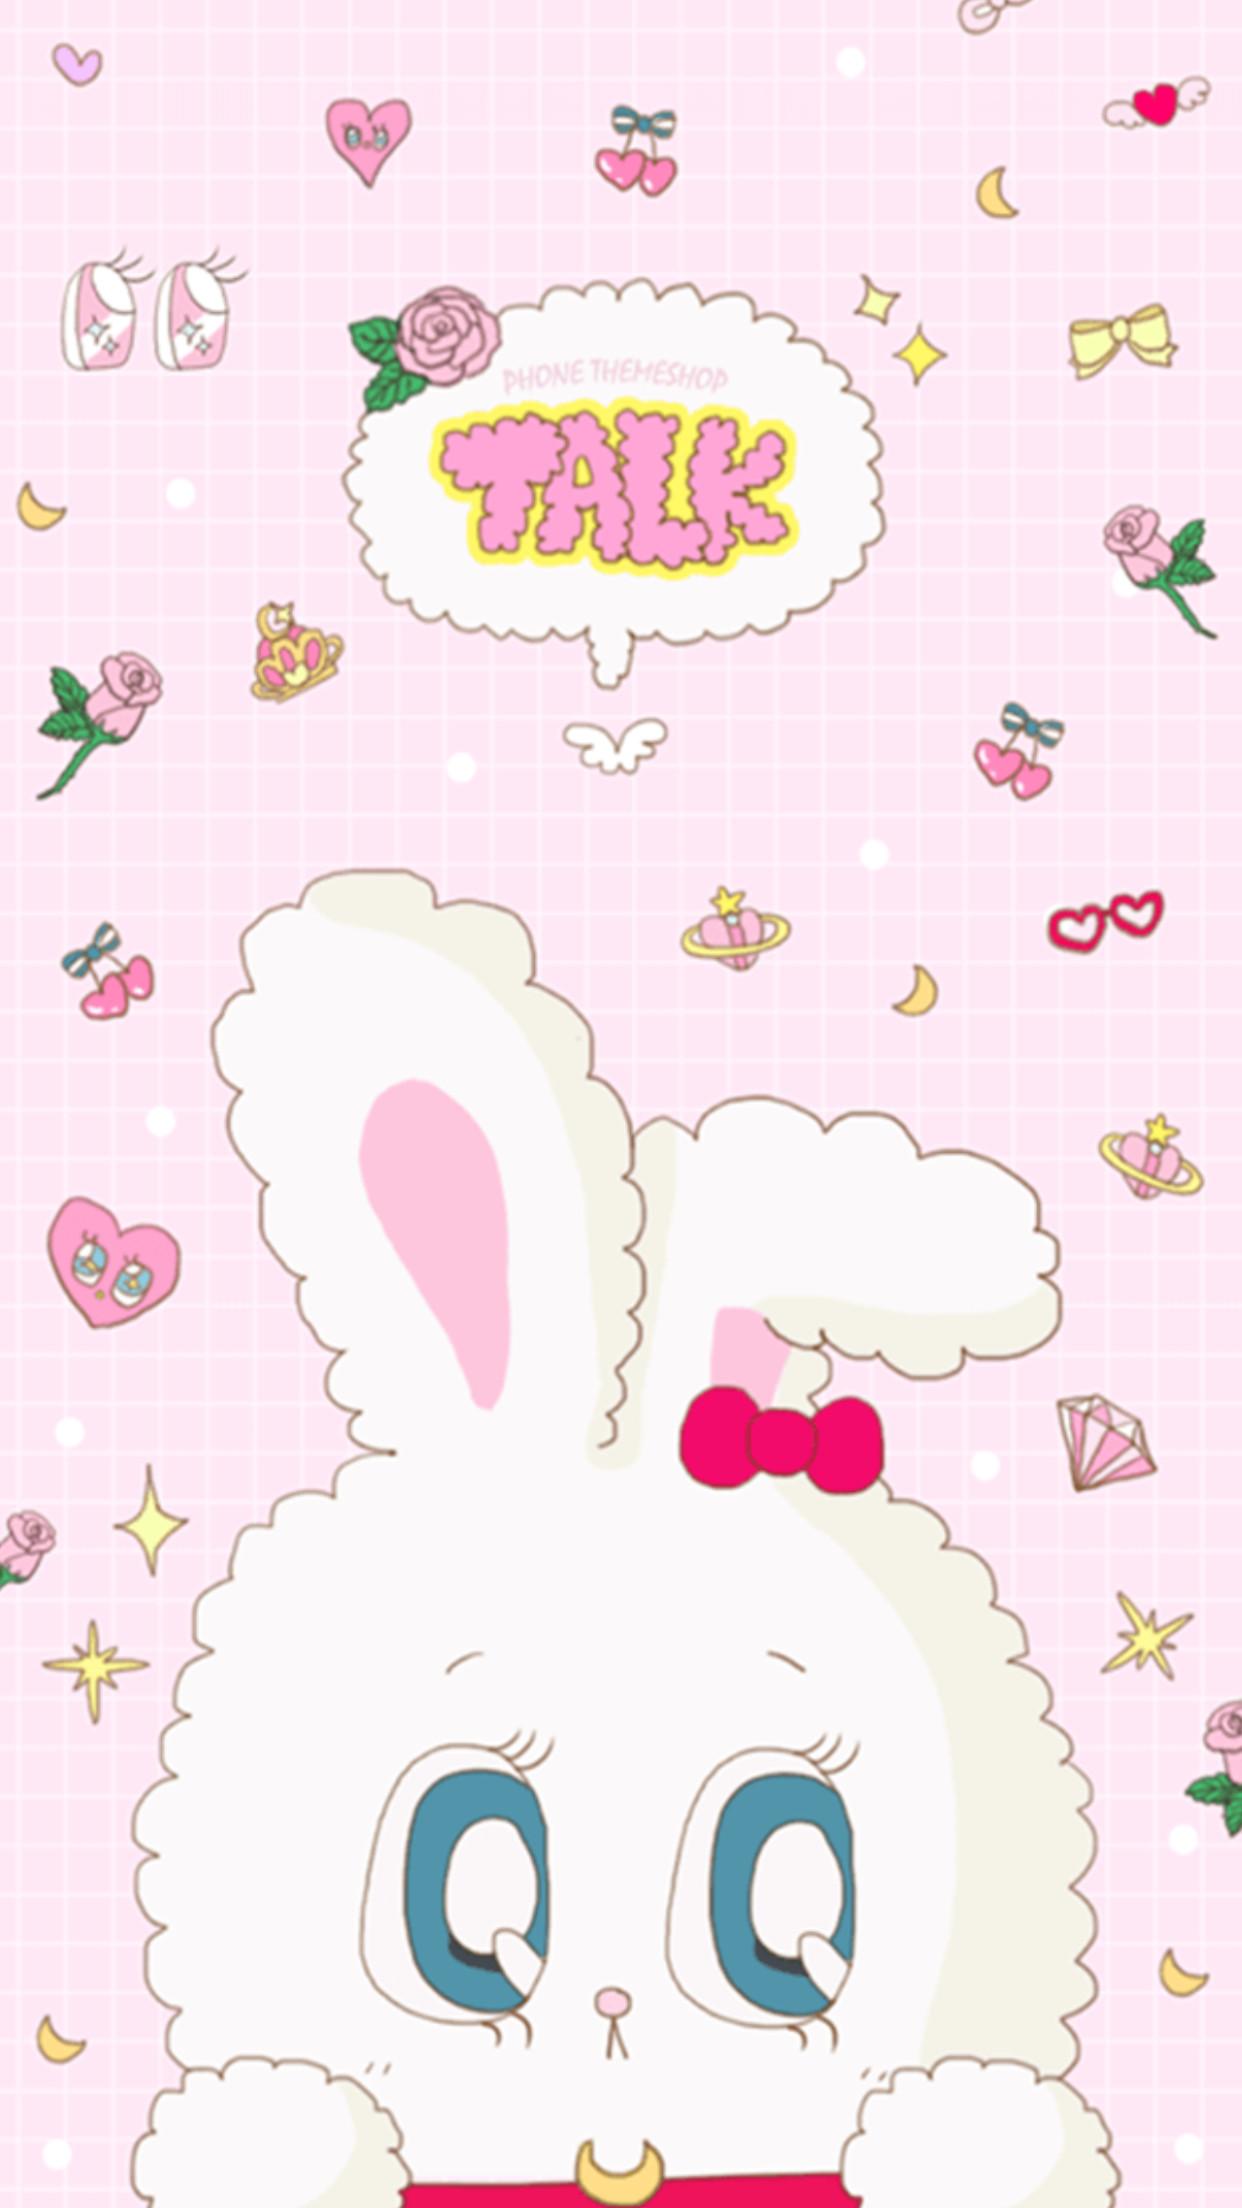 Phone Wallpapers, Kawaii, Manga, Girl Things, Anime, Animation, Screen,  Funds